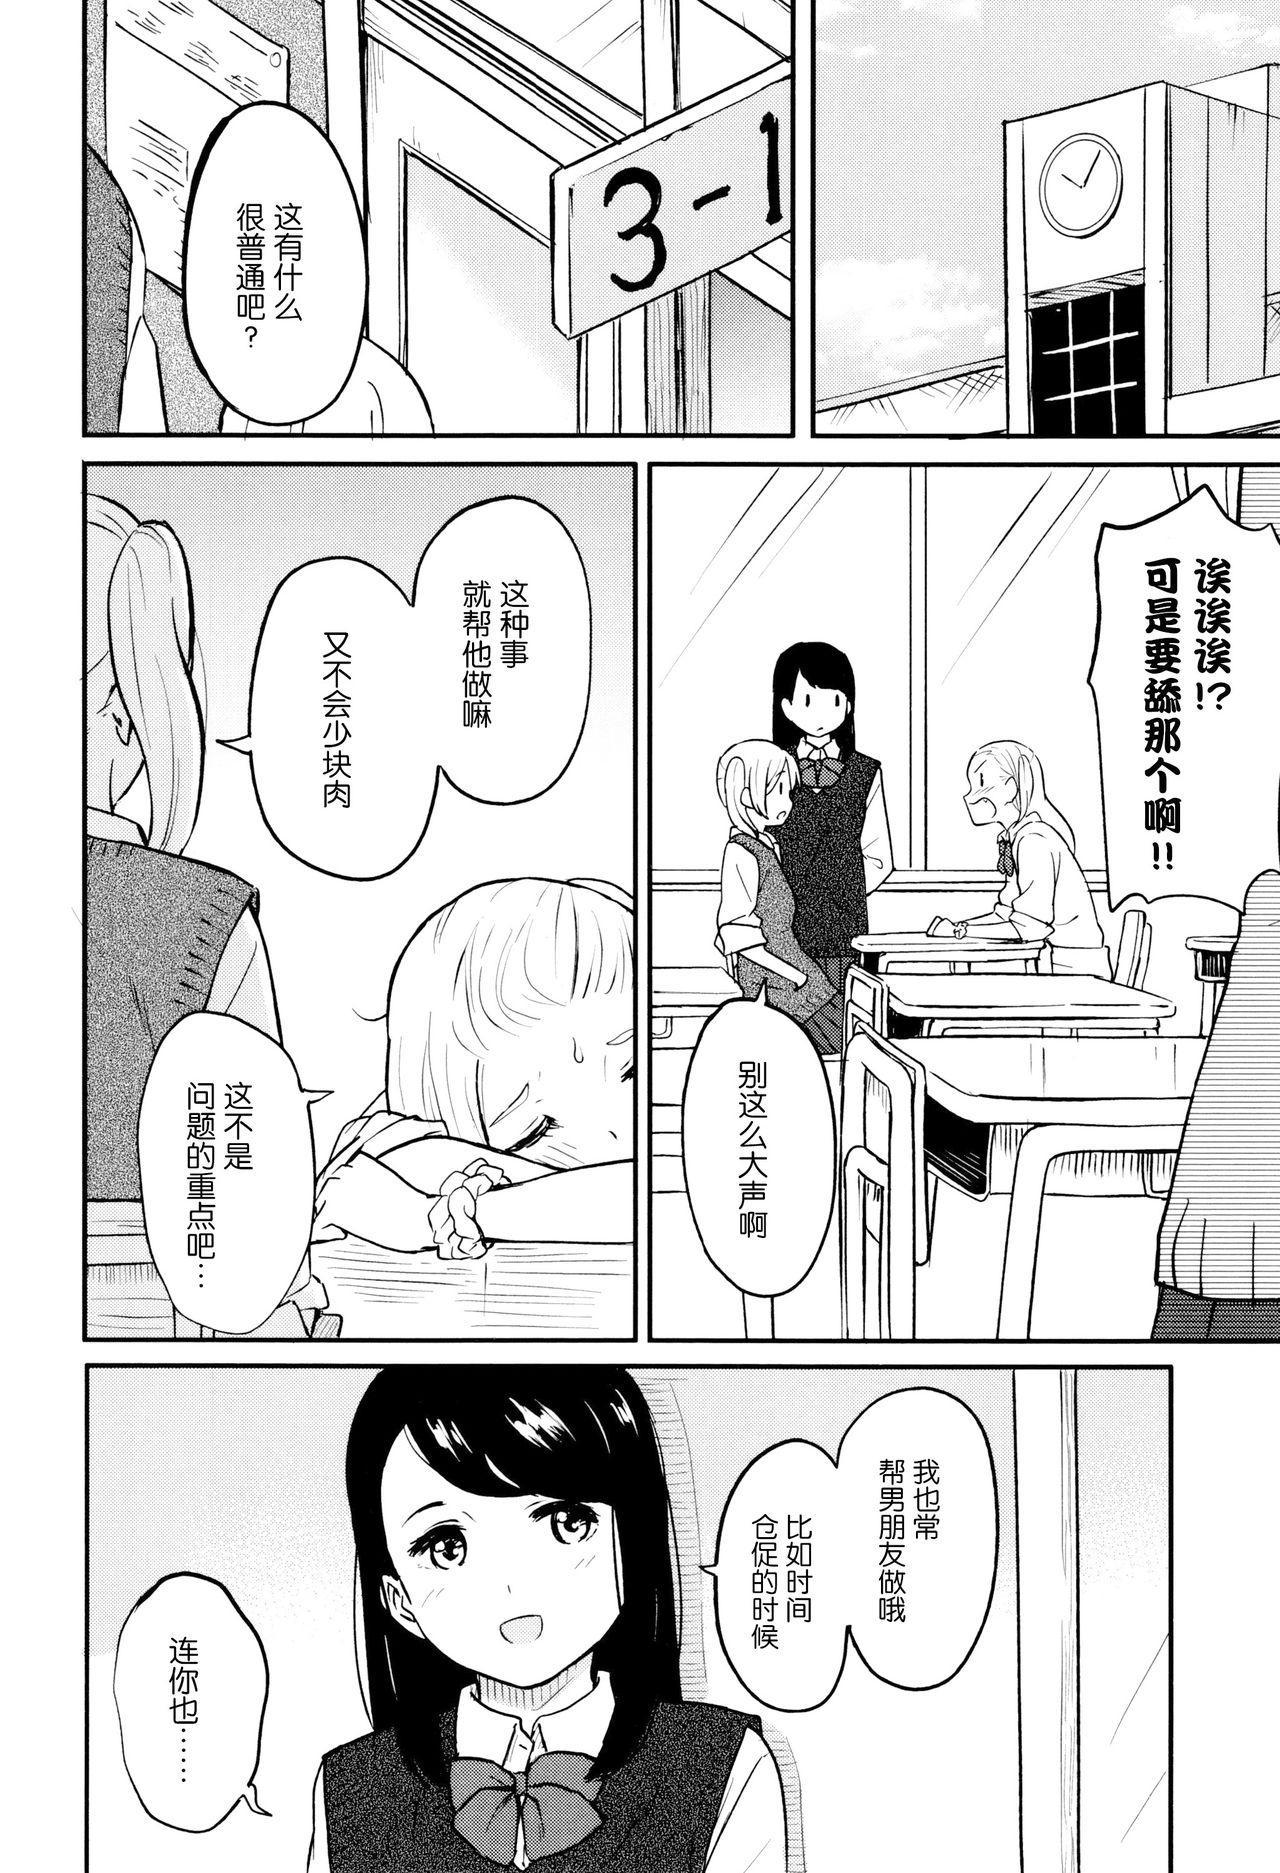 Tokubetsu na Mainichi - Special daily 72